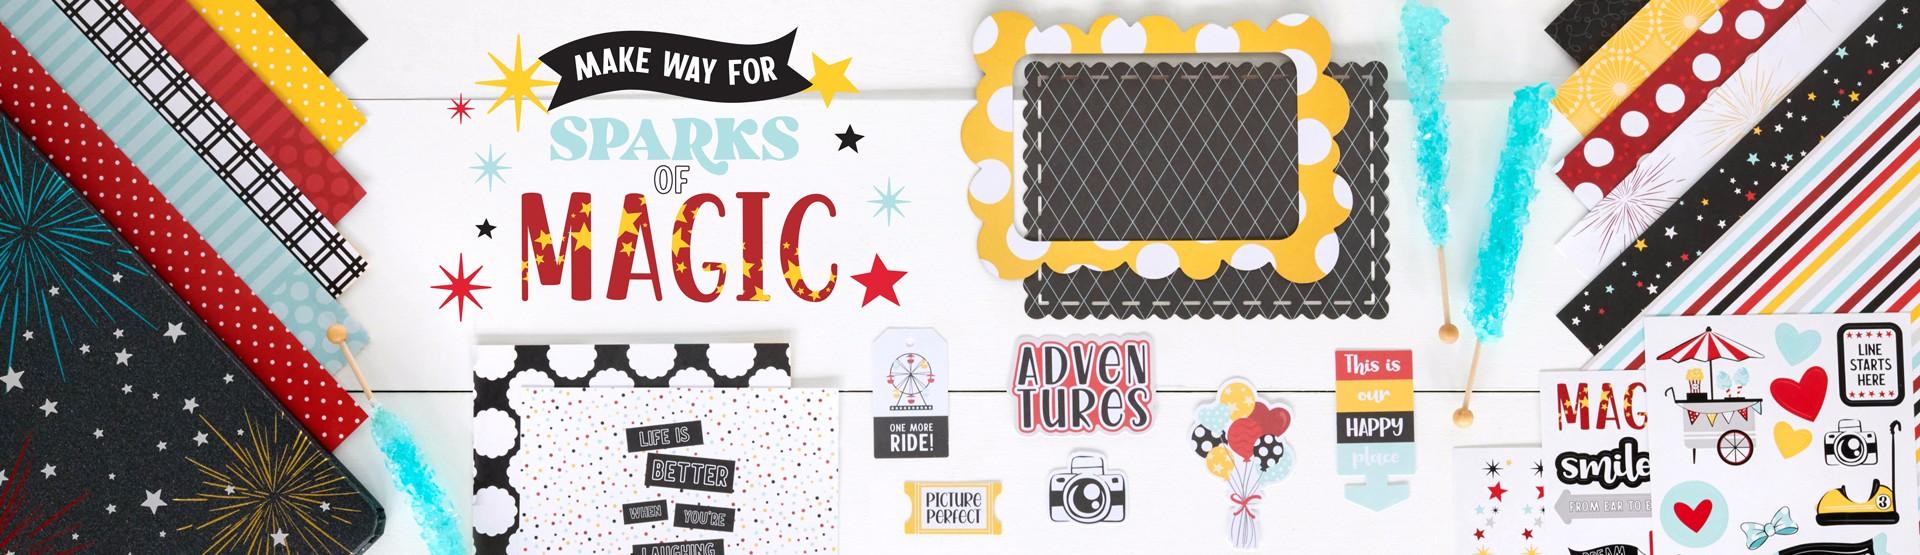 Amusement Park Scrapbooking Supplies: Sparks of Magic